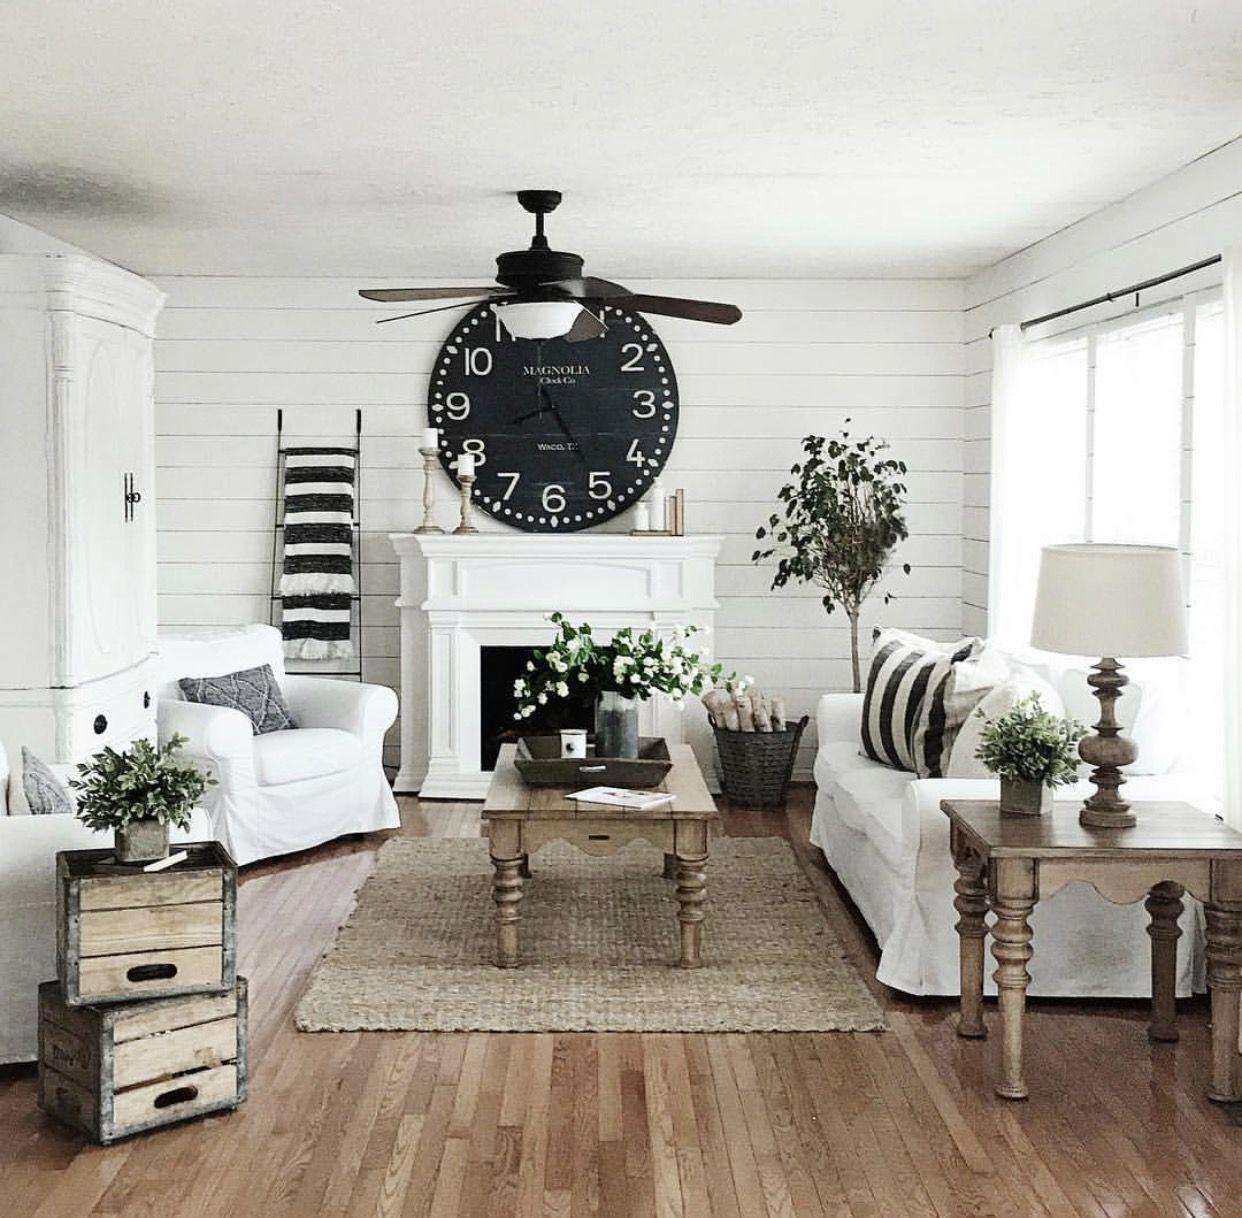 Pin by Emsley Snyder on design | living | Pinterest | Living rooms ...